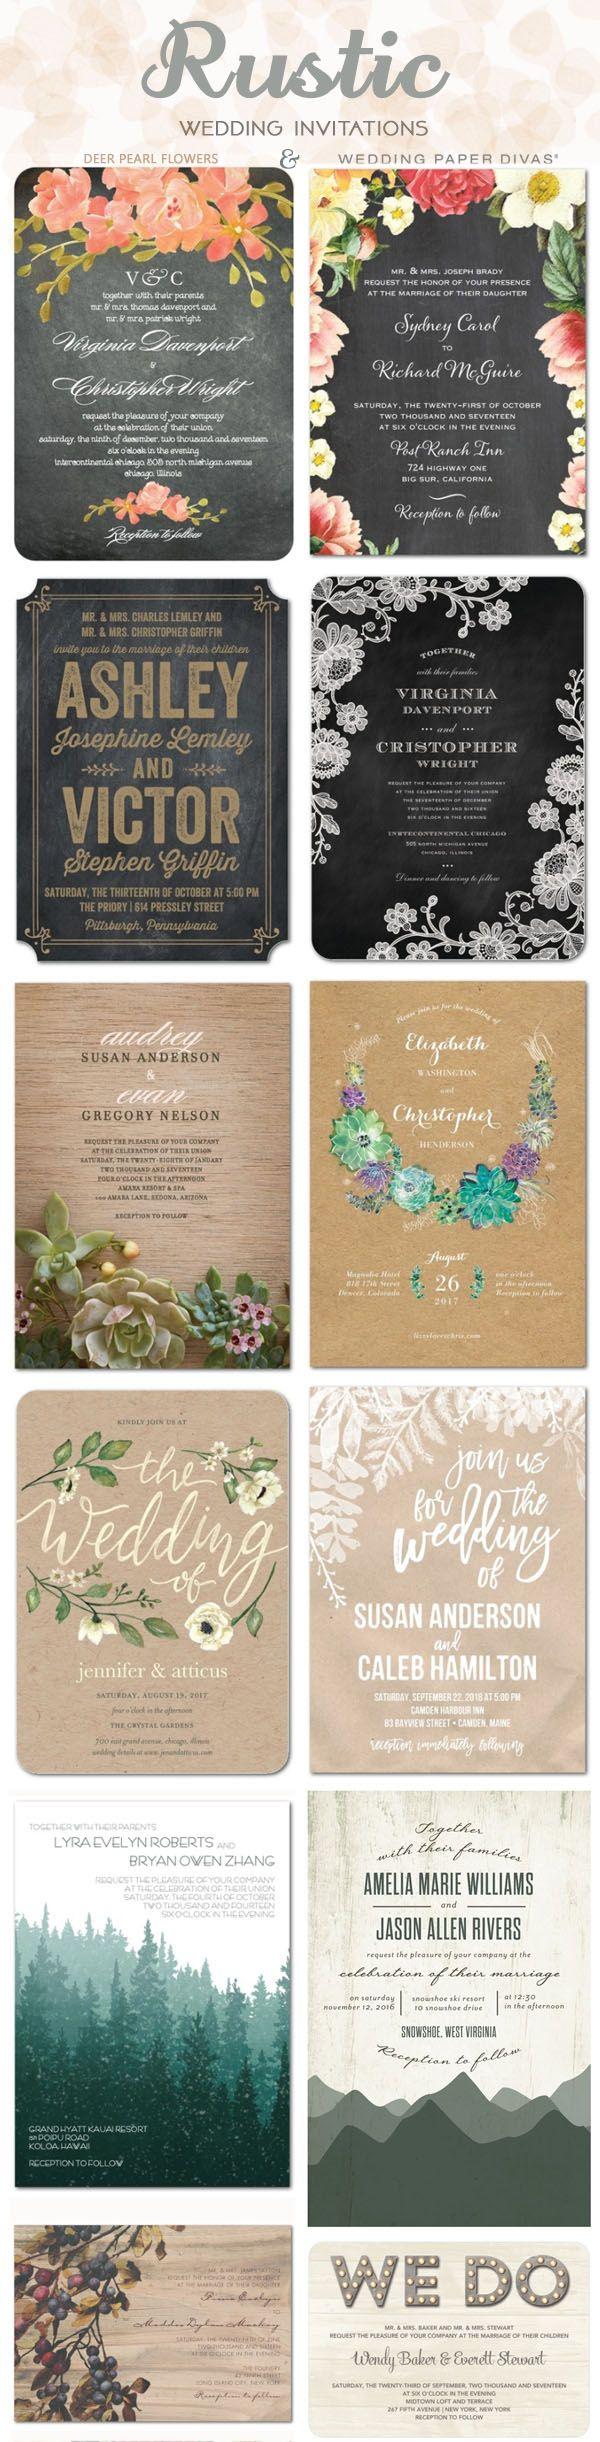 Rustic country wedding invitations ideas / http://www.deerpearlflowers.com/wedding-paper-divas-wedding-invitations/